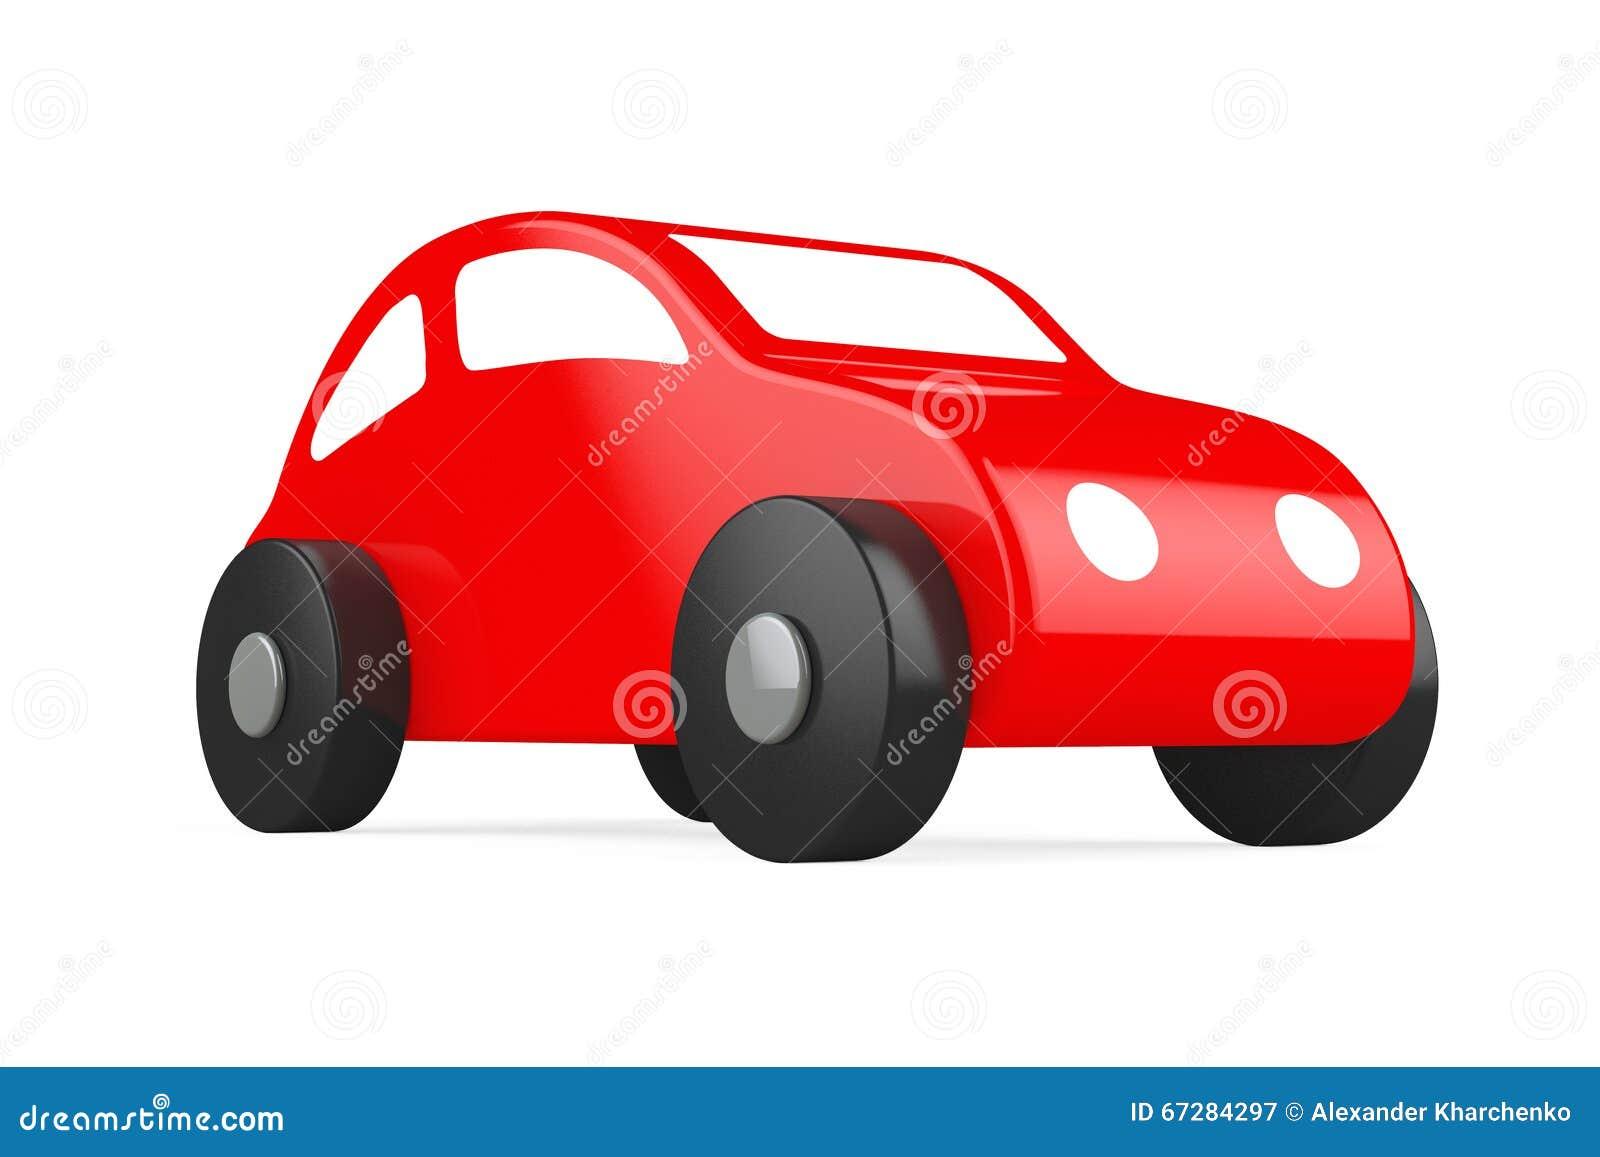 Rood Beeldverhaal Toy Car